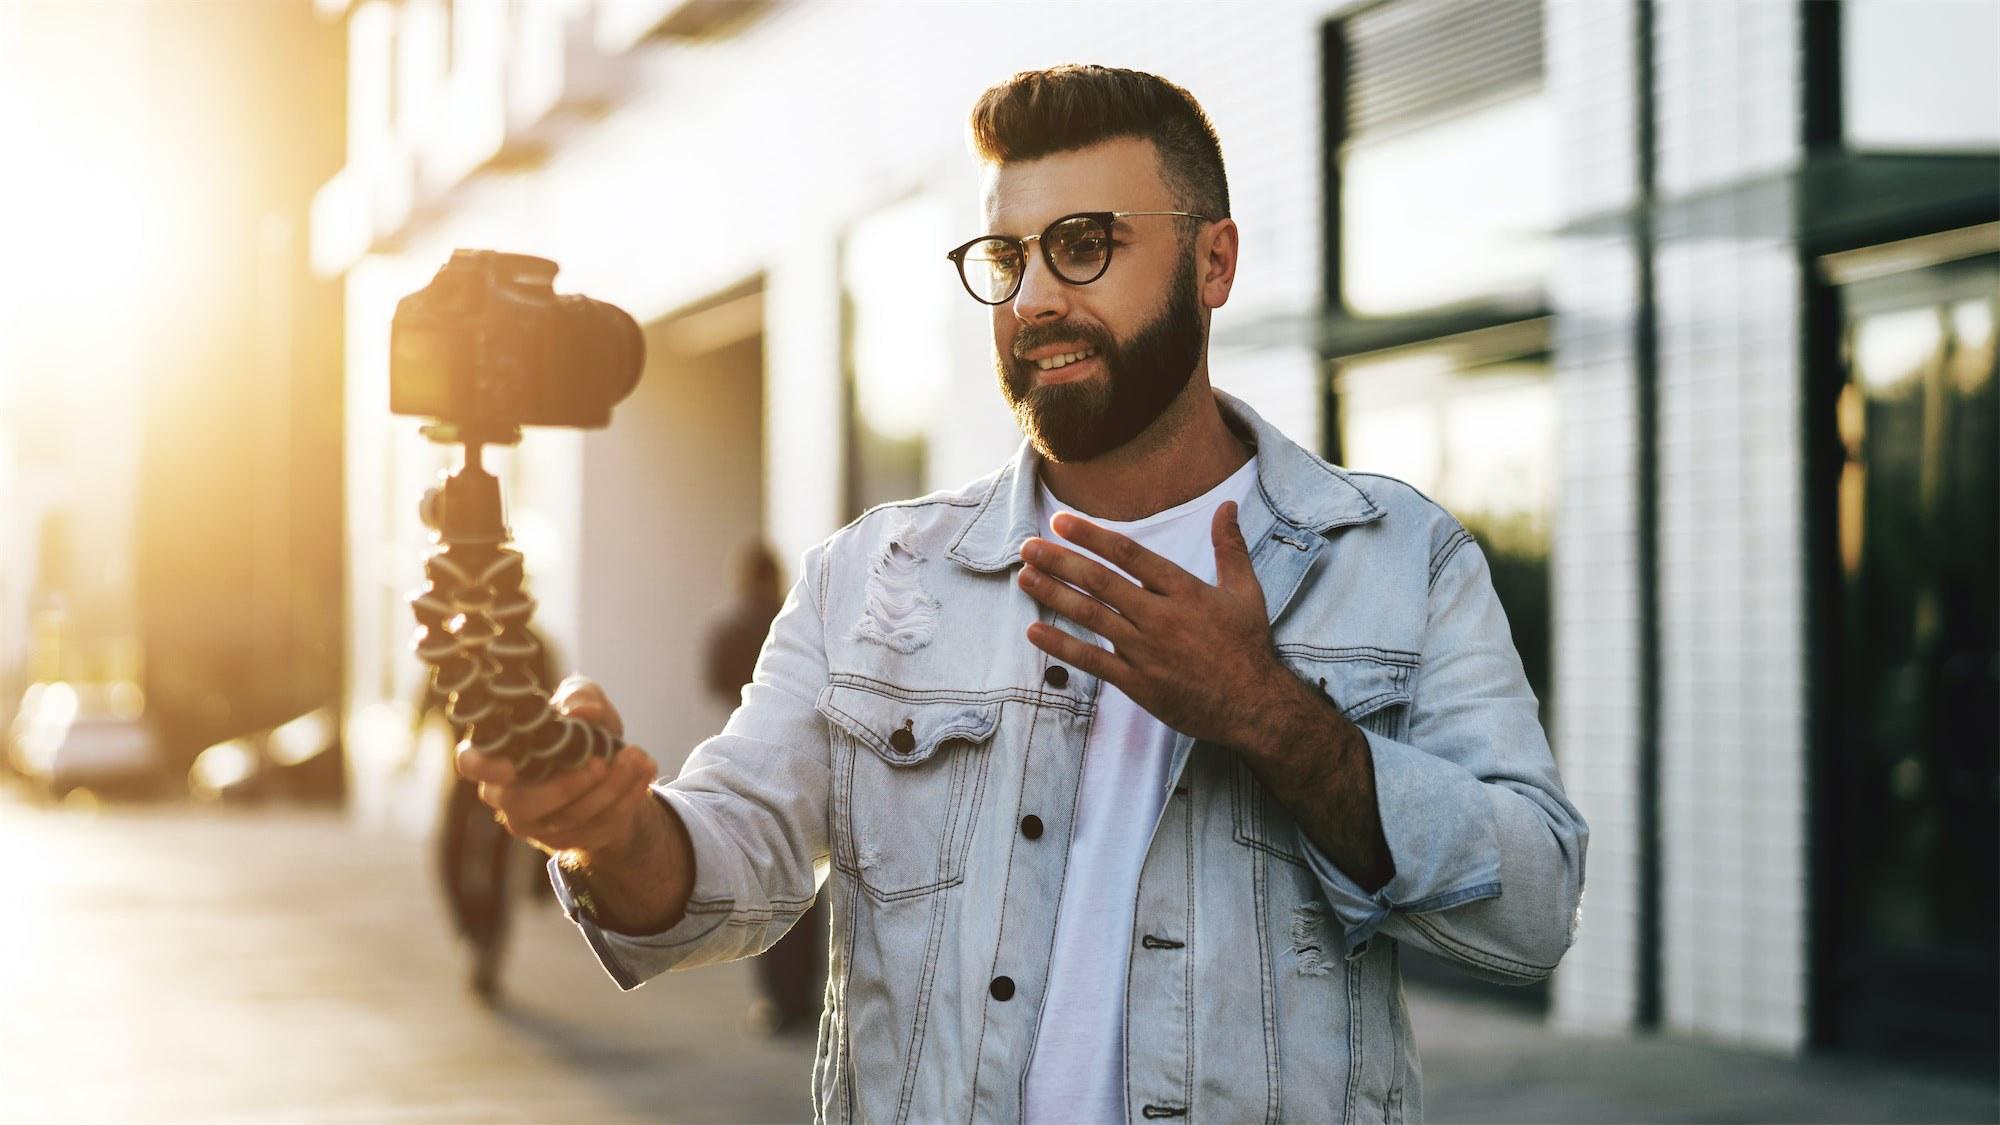 Self video recording